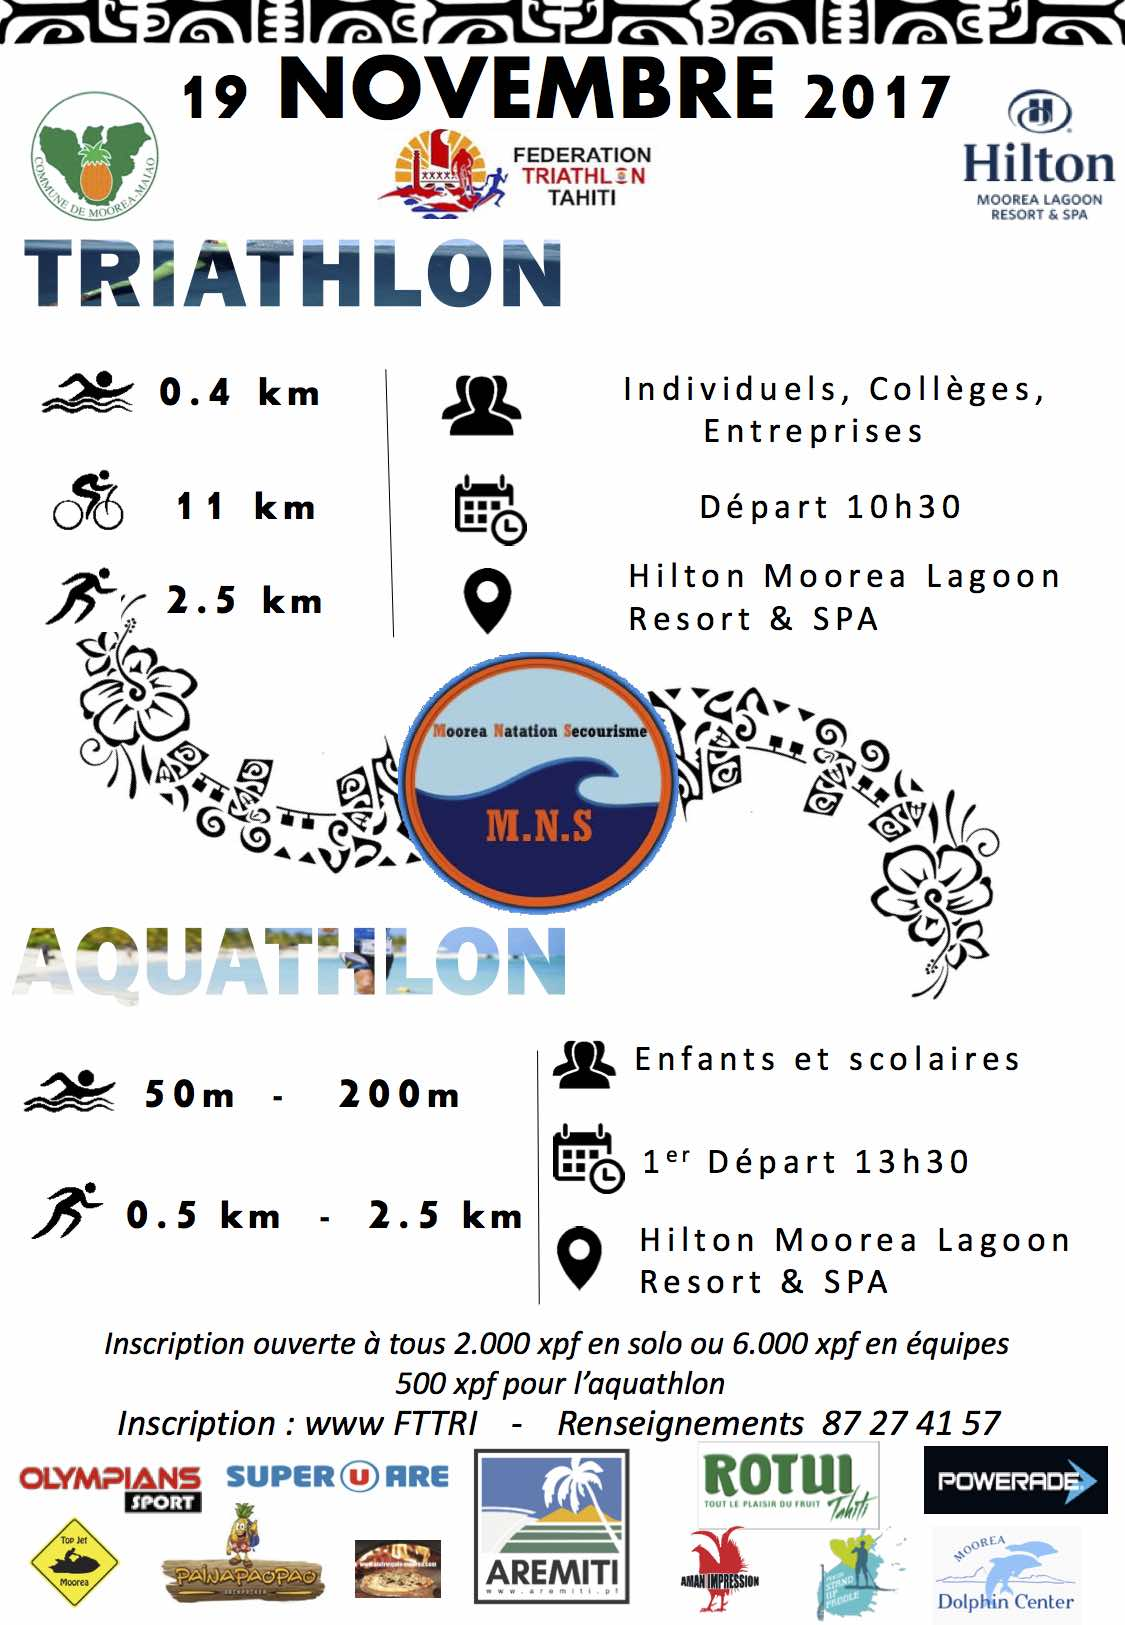 Triathlon – Moorea Natation Tri : Le triathlon se développe à Moorea